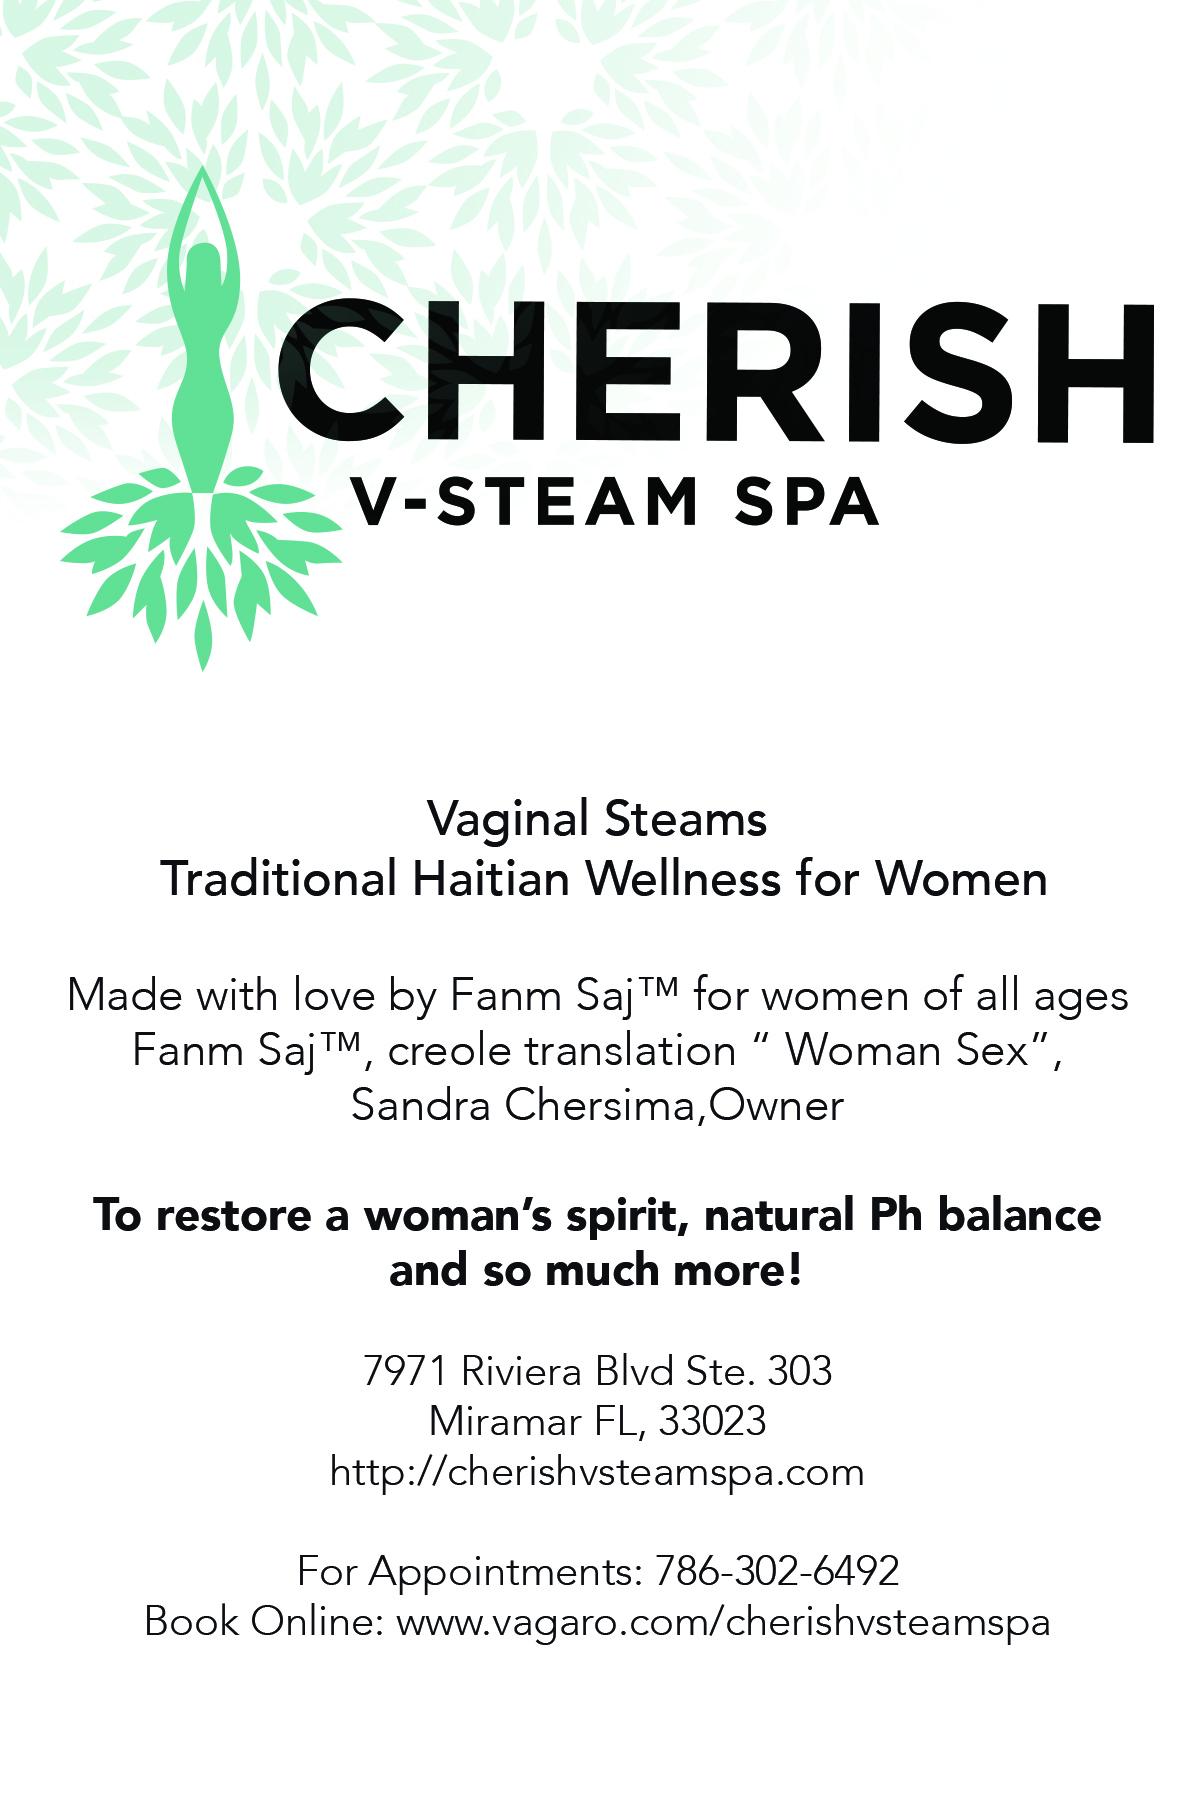 CherishV-Steam-Flyer.jpg